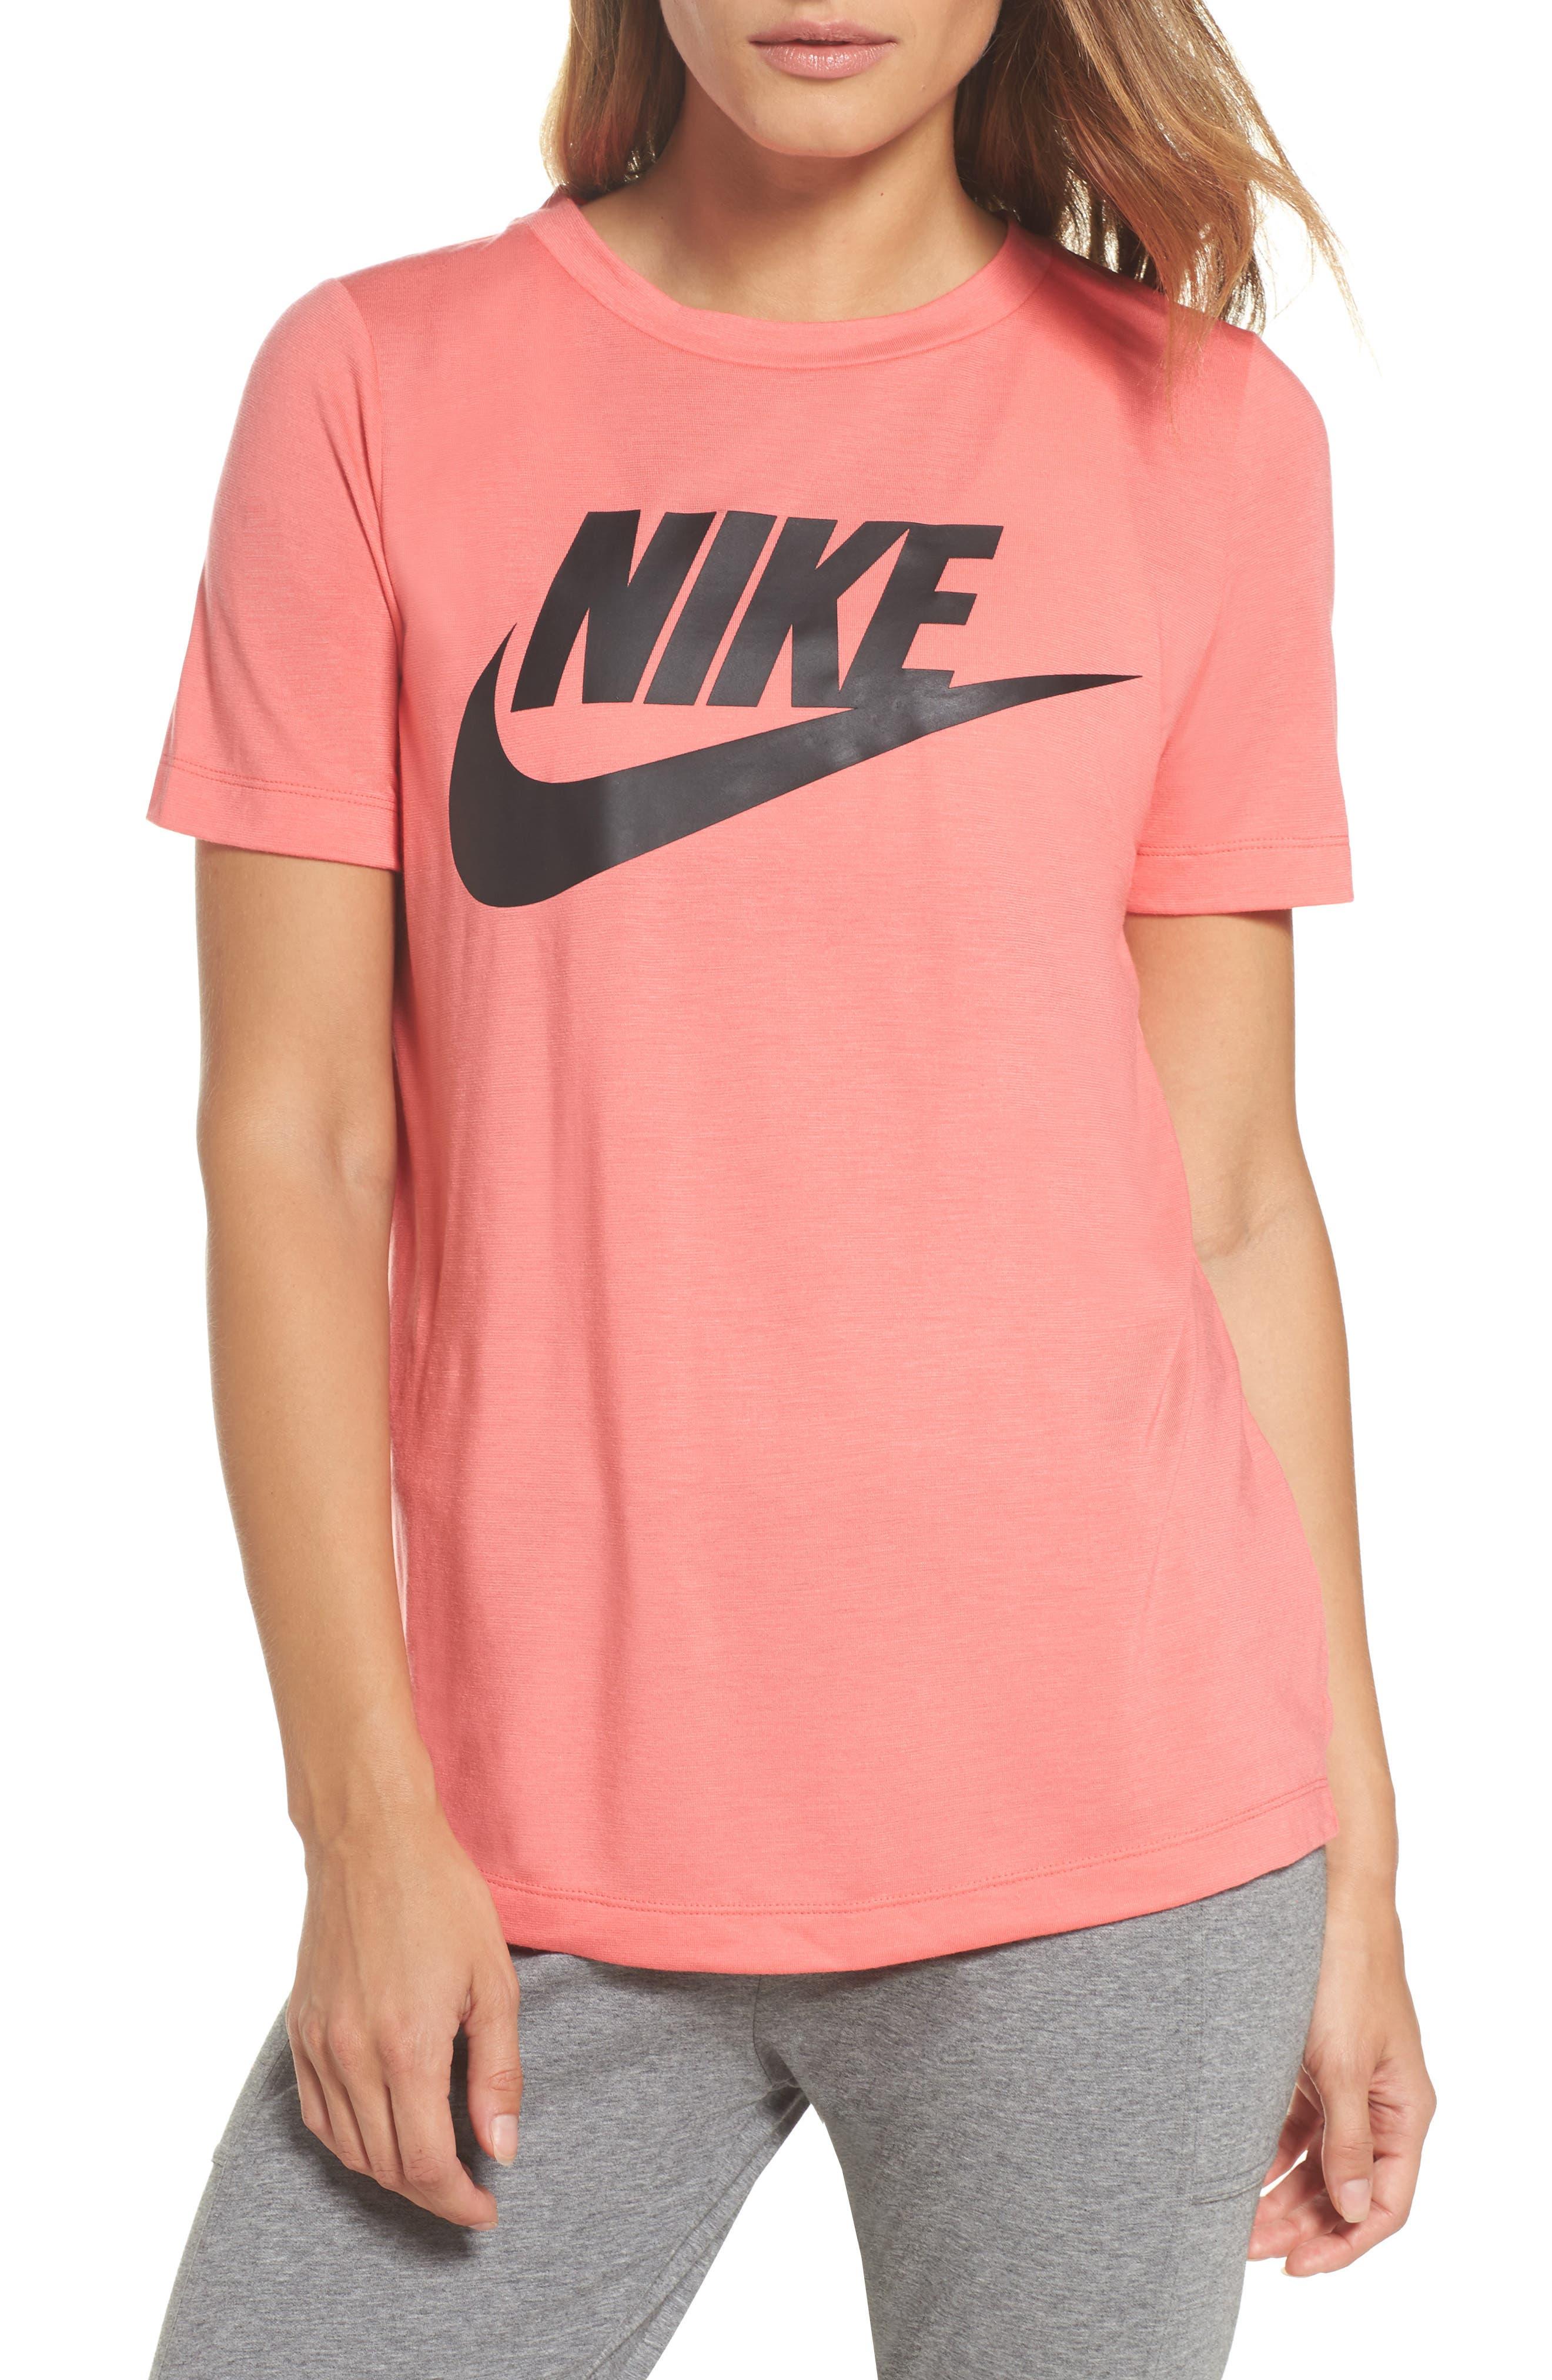 Sportswear Essential Tee,                         Main,                         color, Sea Coral/ Sea Coral/ Black